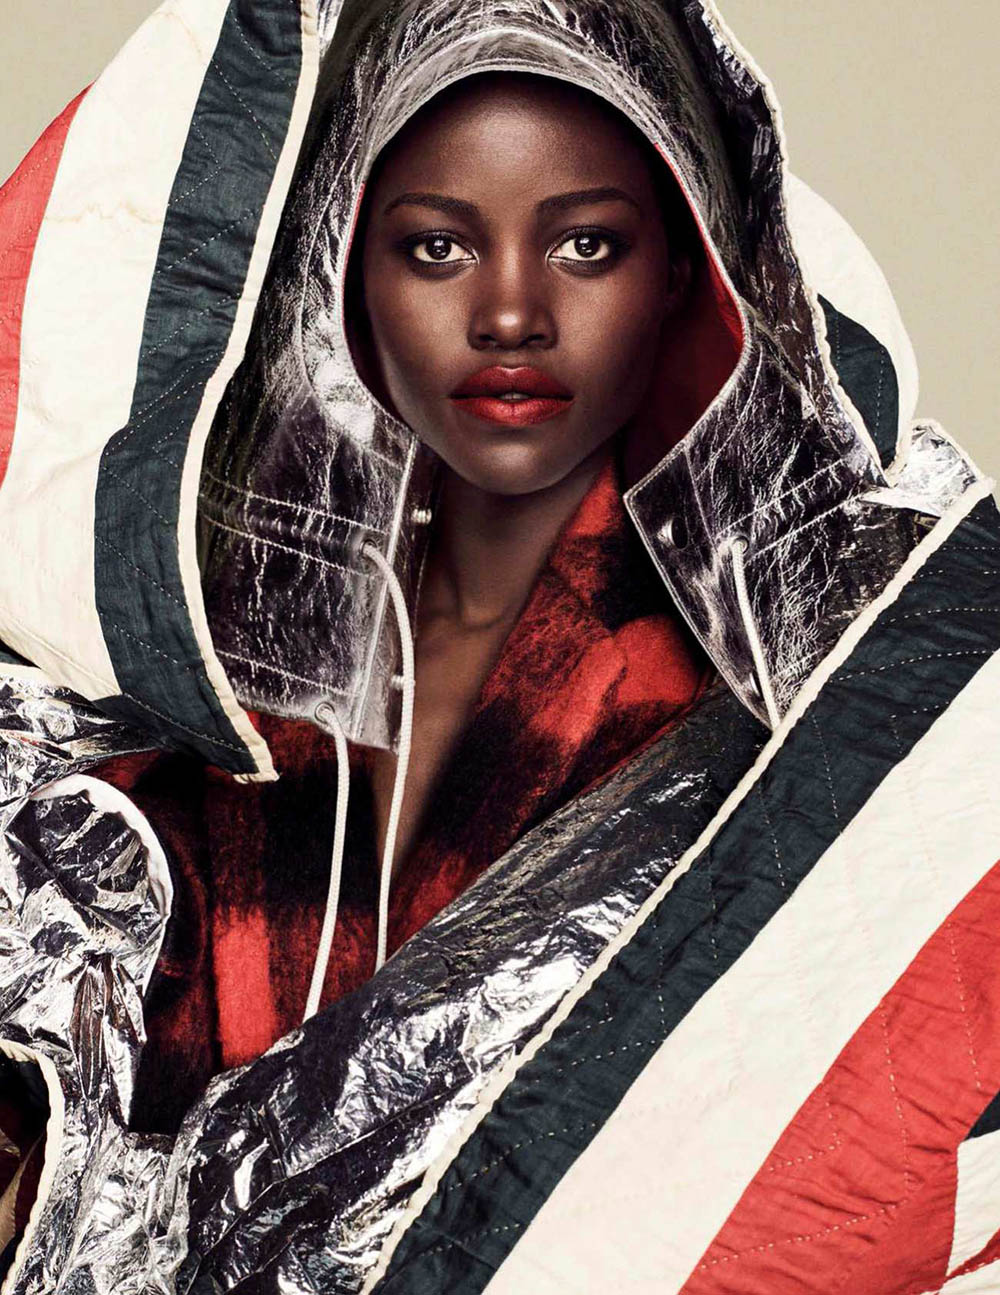 Lupita Nyong'o covers Vogue Spain November 2018 by Luigi & Iango